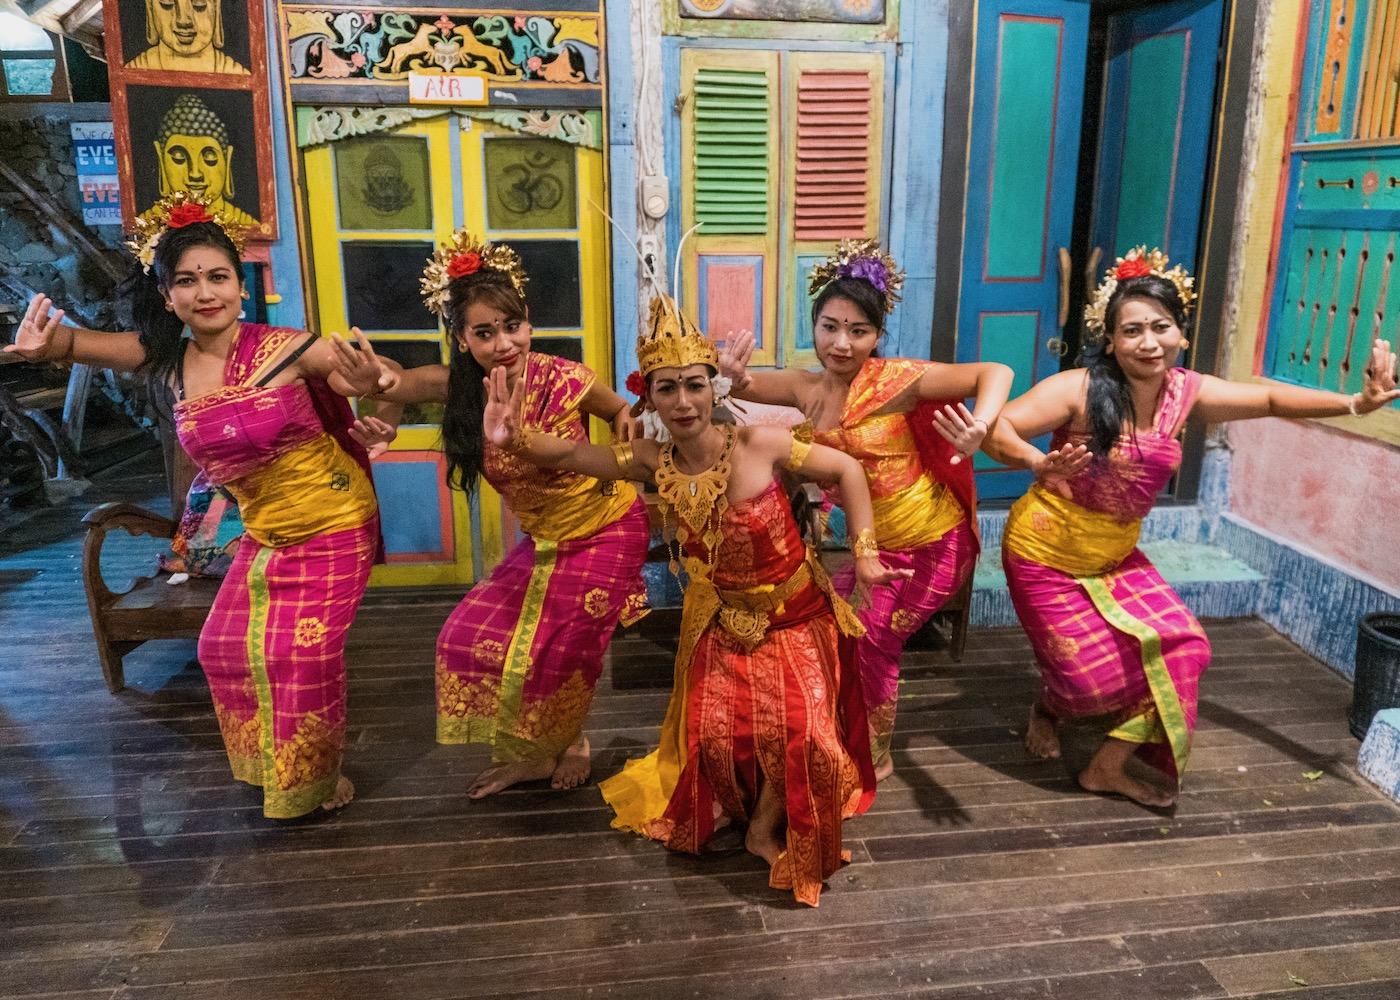 Balinese Dance at Santhika Retreat Centre in Lovina